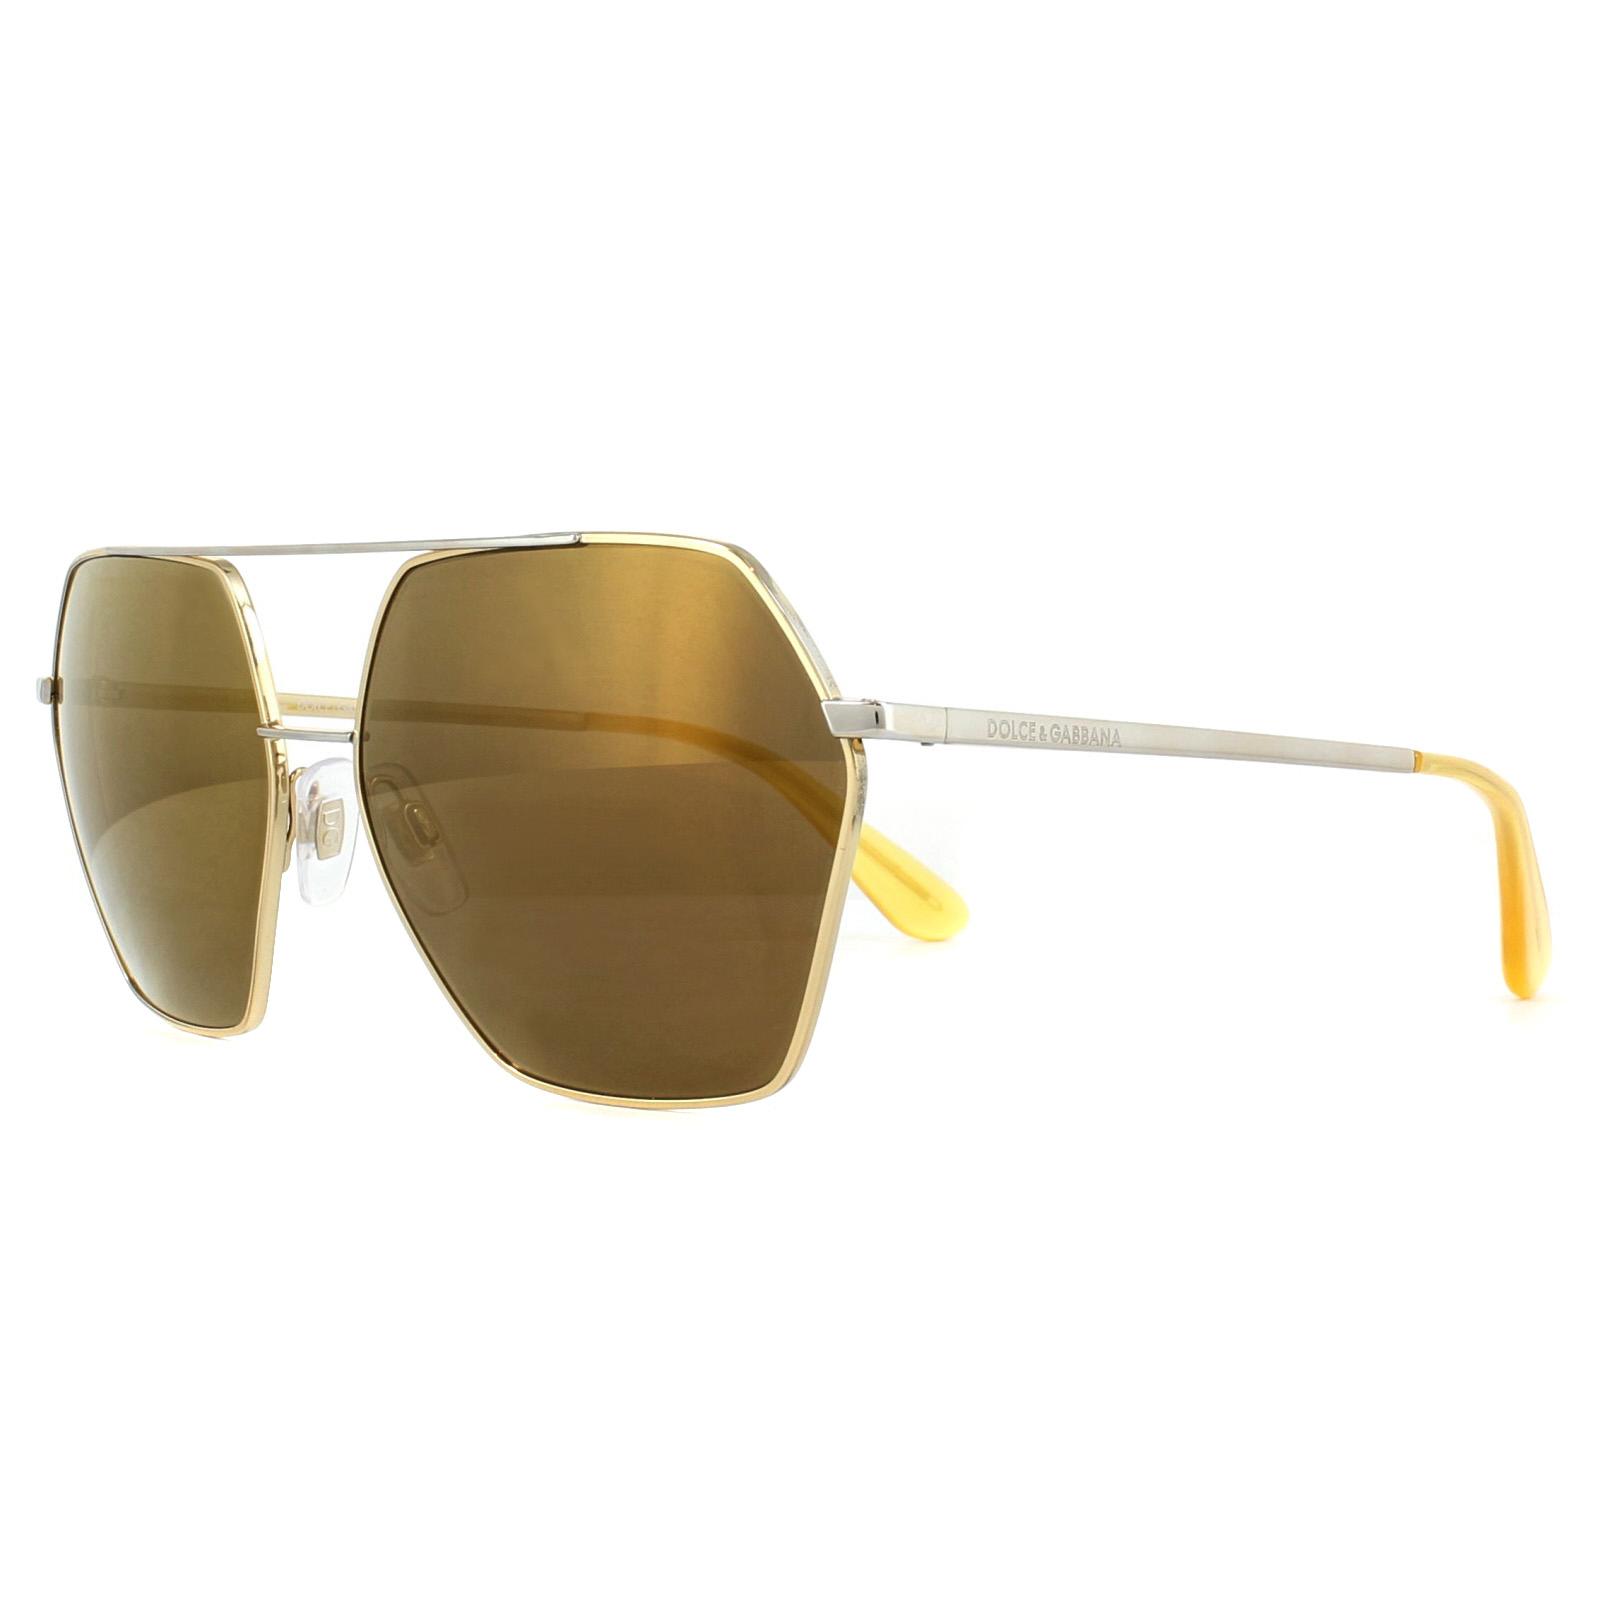 a809f84f040 Dolce   Gabbana Sunglasses 2157 02-N0 Gold 24K Iridium 8053672697360 ...